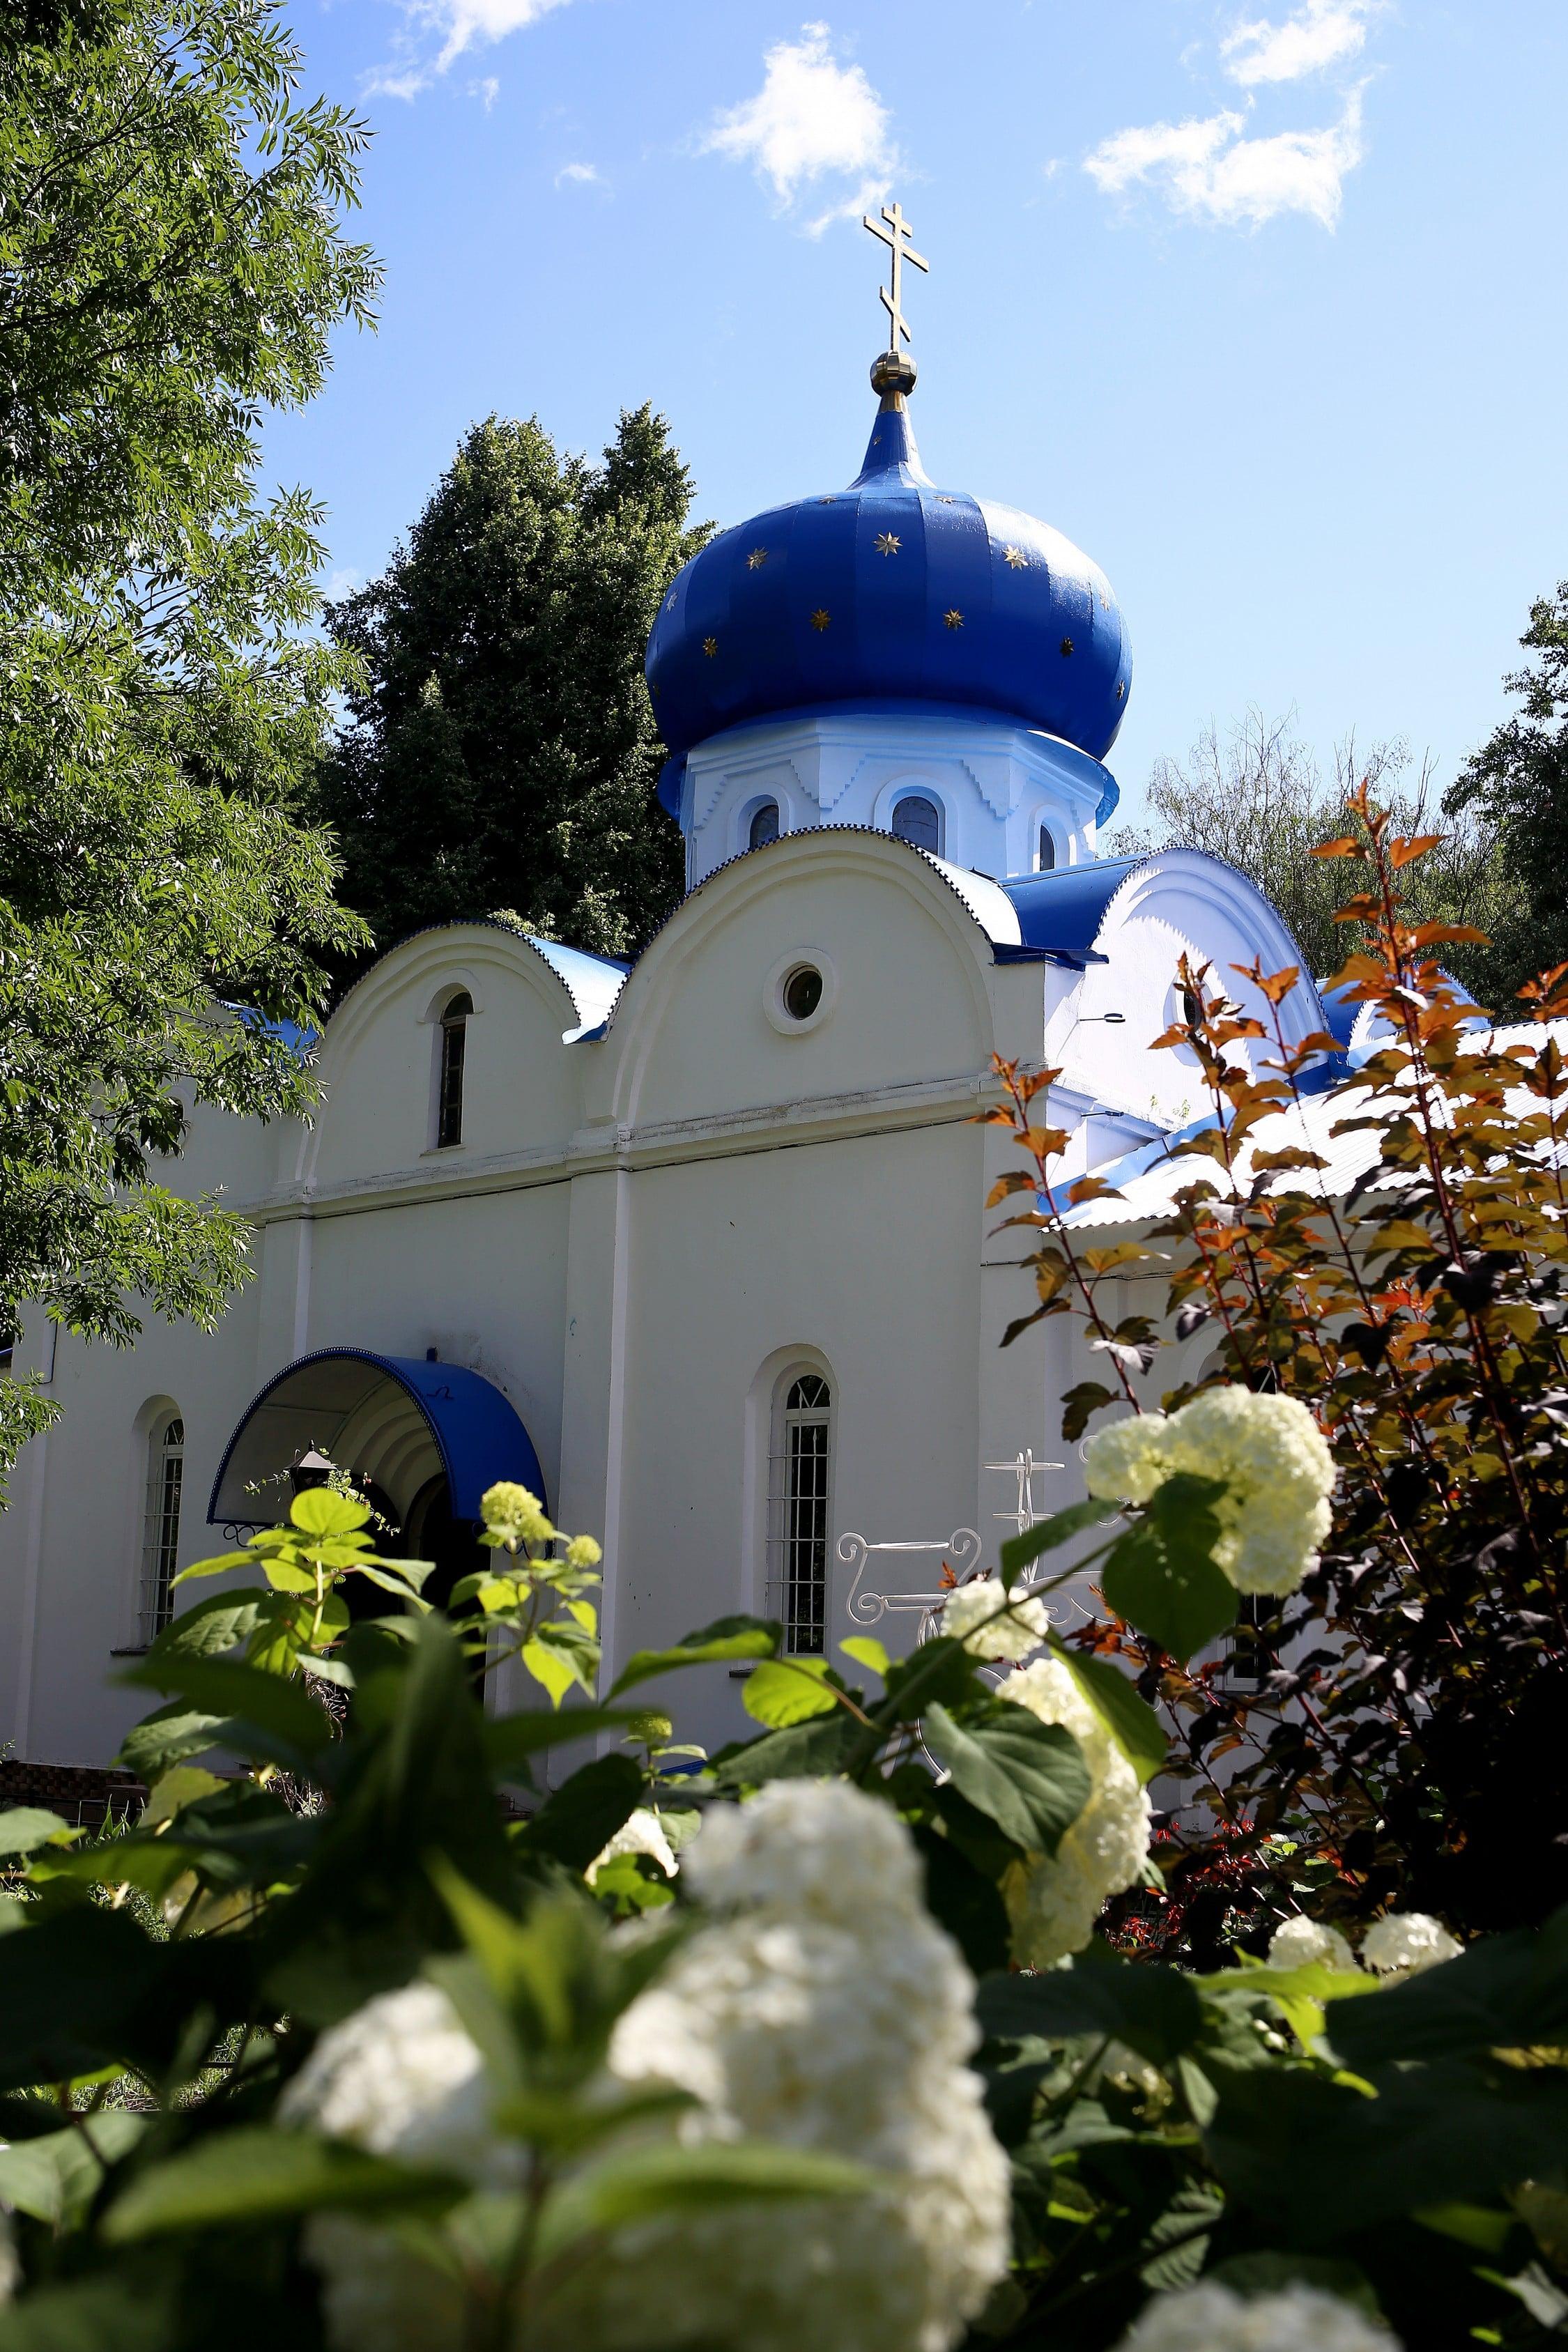 http://monuspen.ru/photoreports/14b72a43bf568736ebc953d1a903f306.jpg